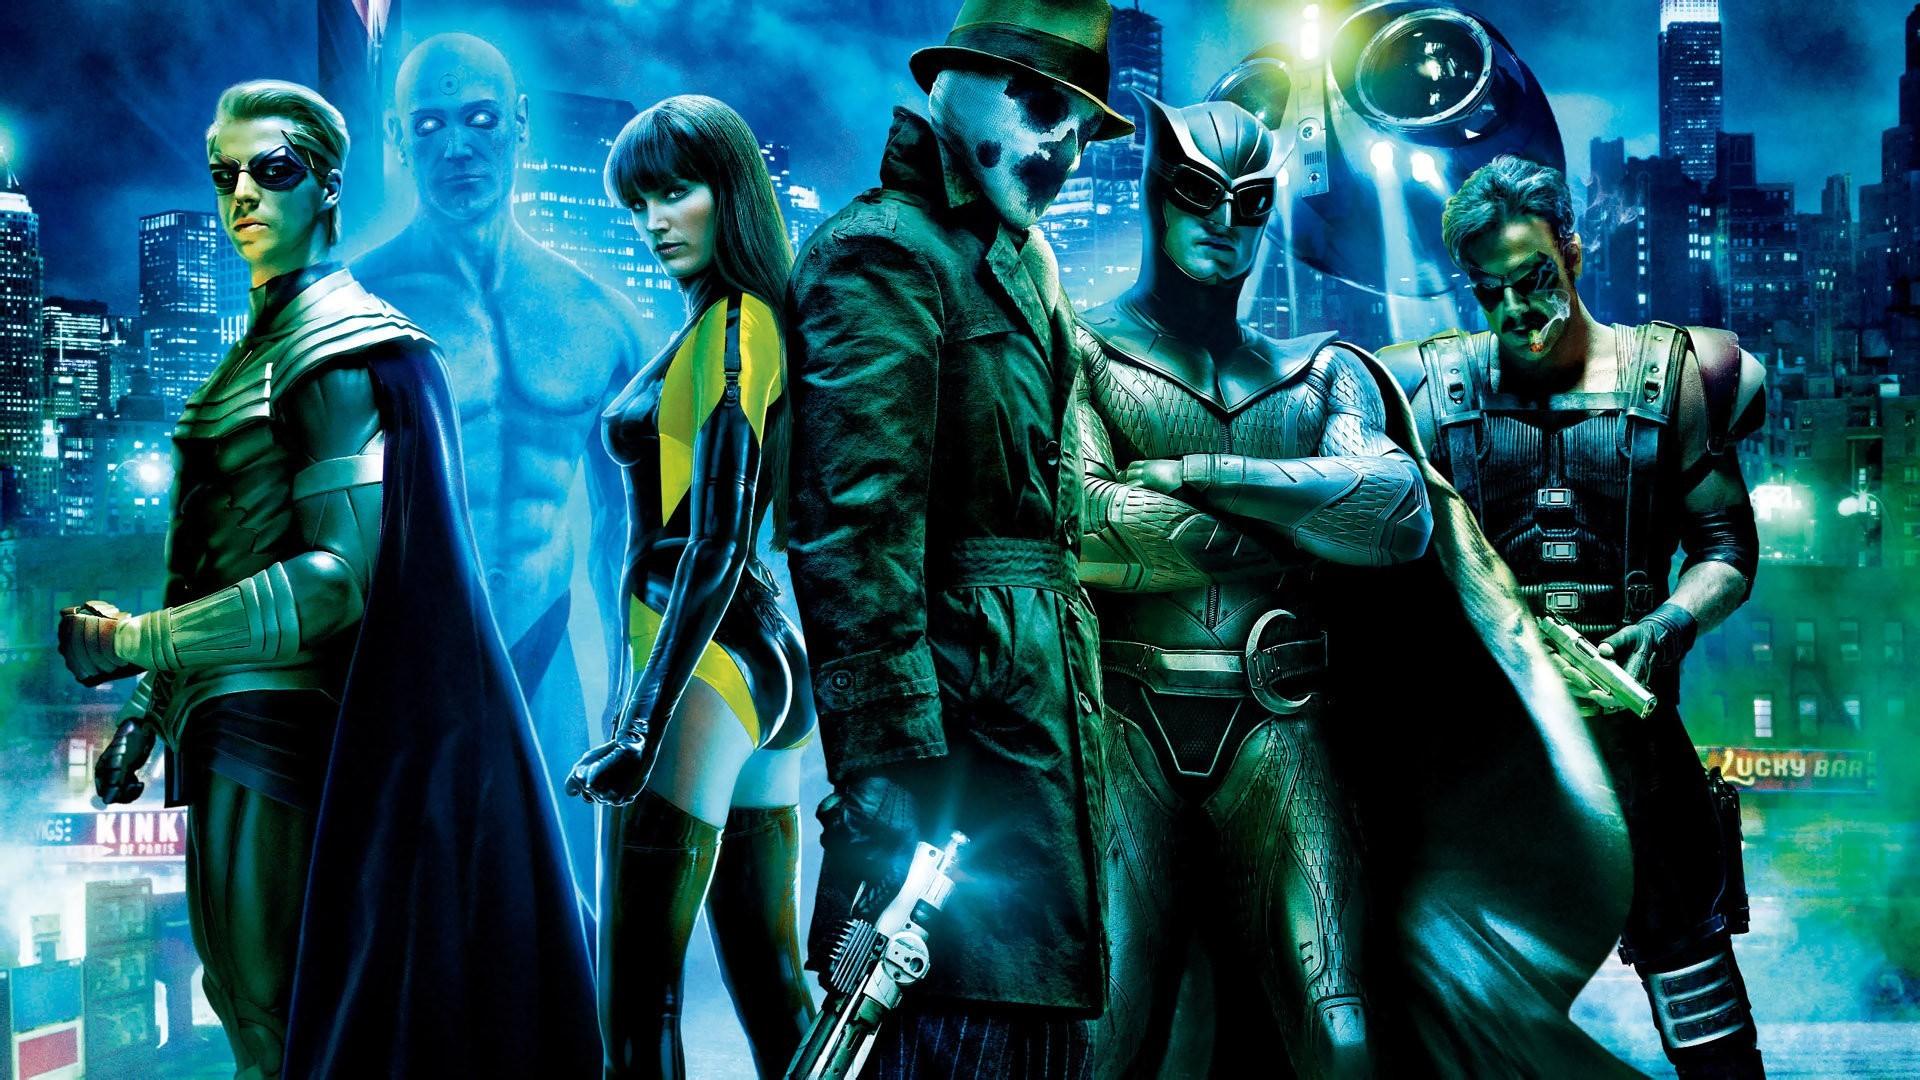 Billy Crudup, Jackie Earle Haley, Patrick Wilson and Jeffery Dean Morgan in Watchmen